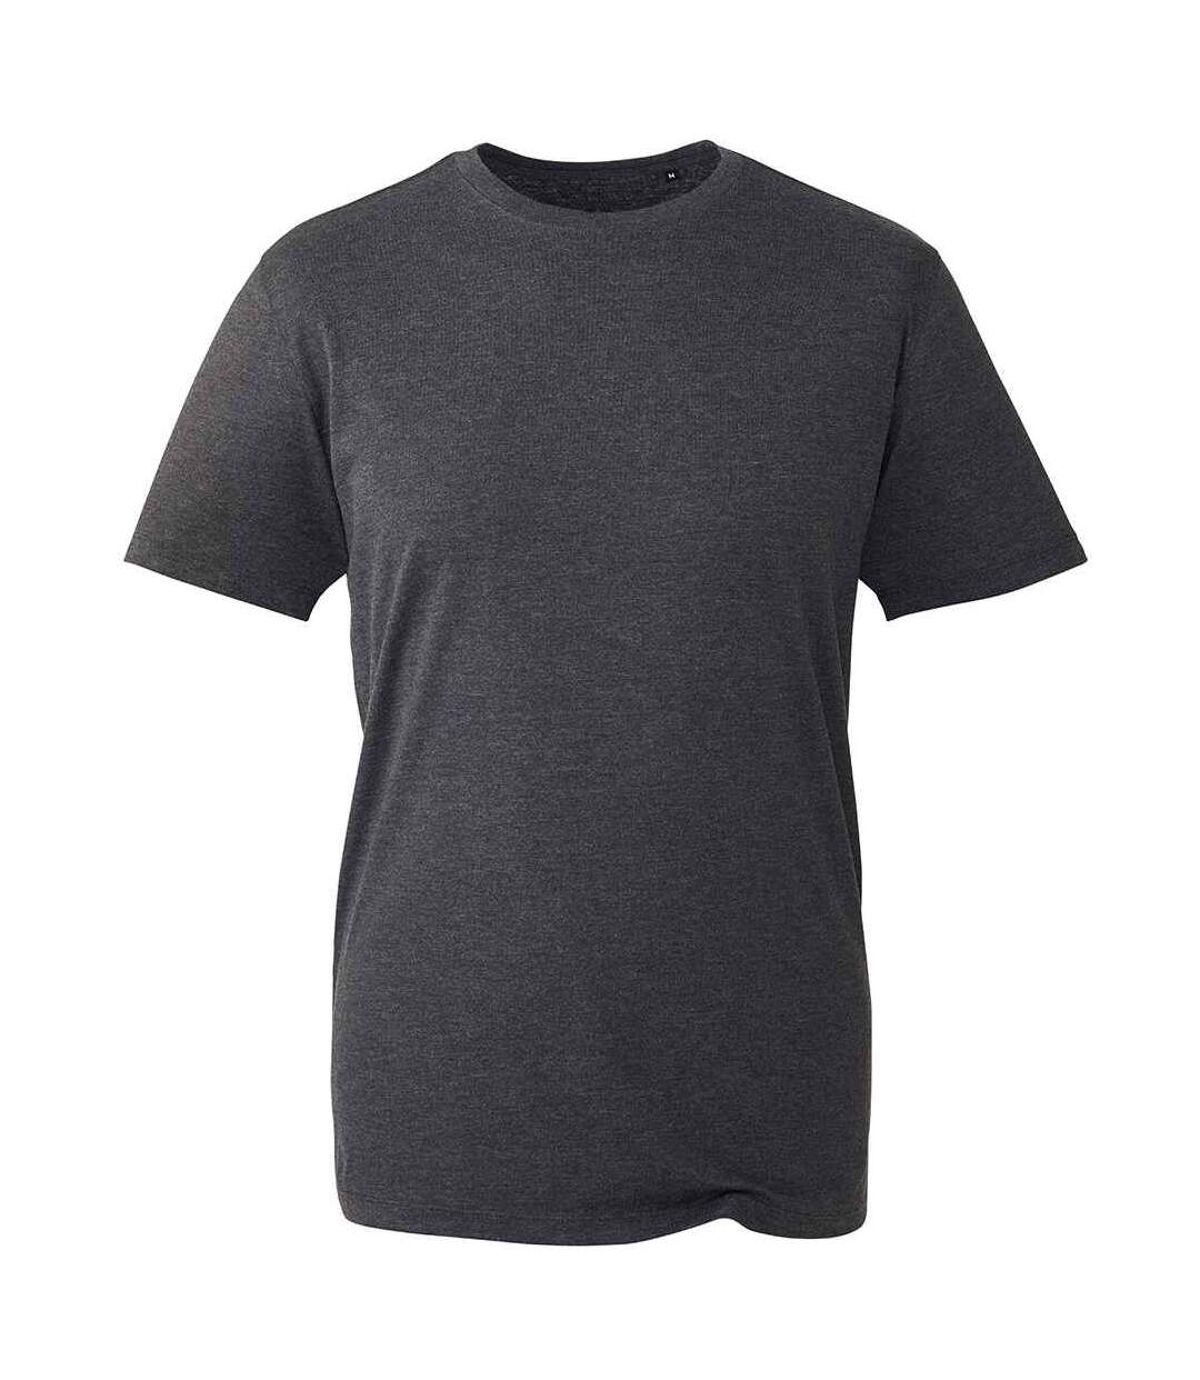 Anthem Mens Marl Organic T-Shirt (Dark Grey) - UTPC4294